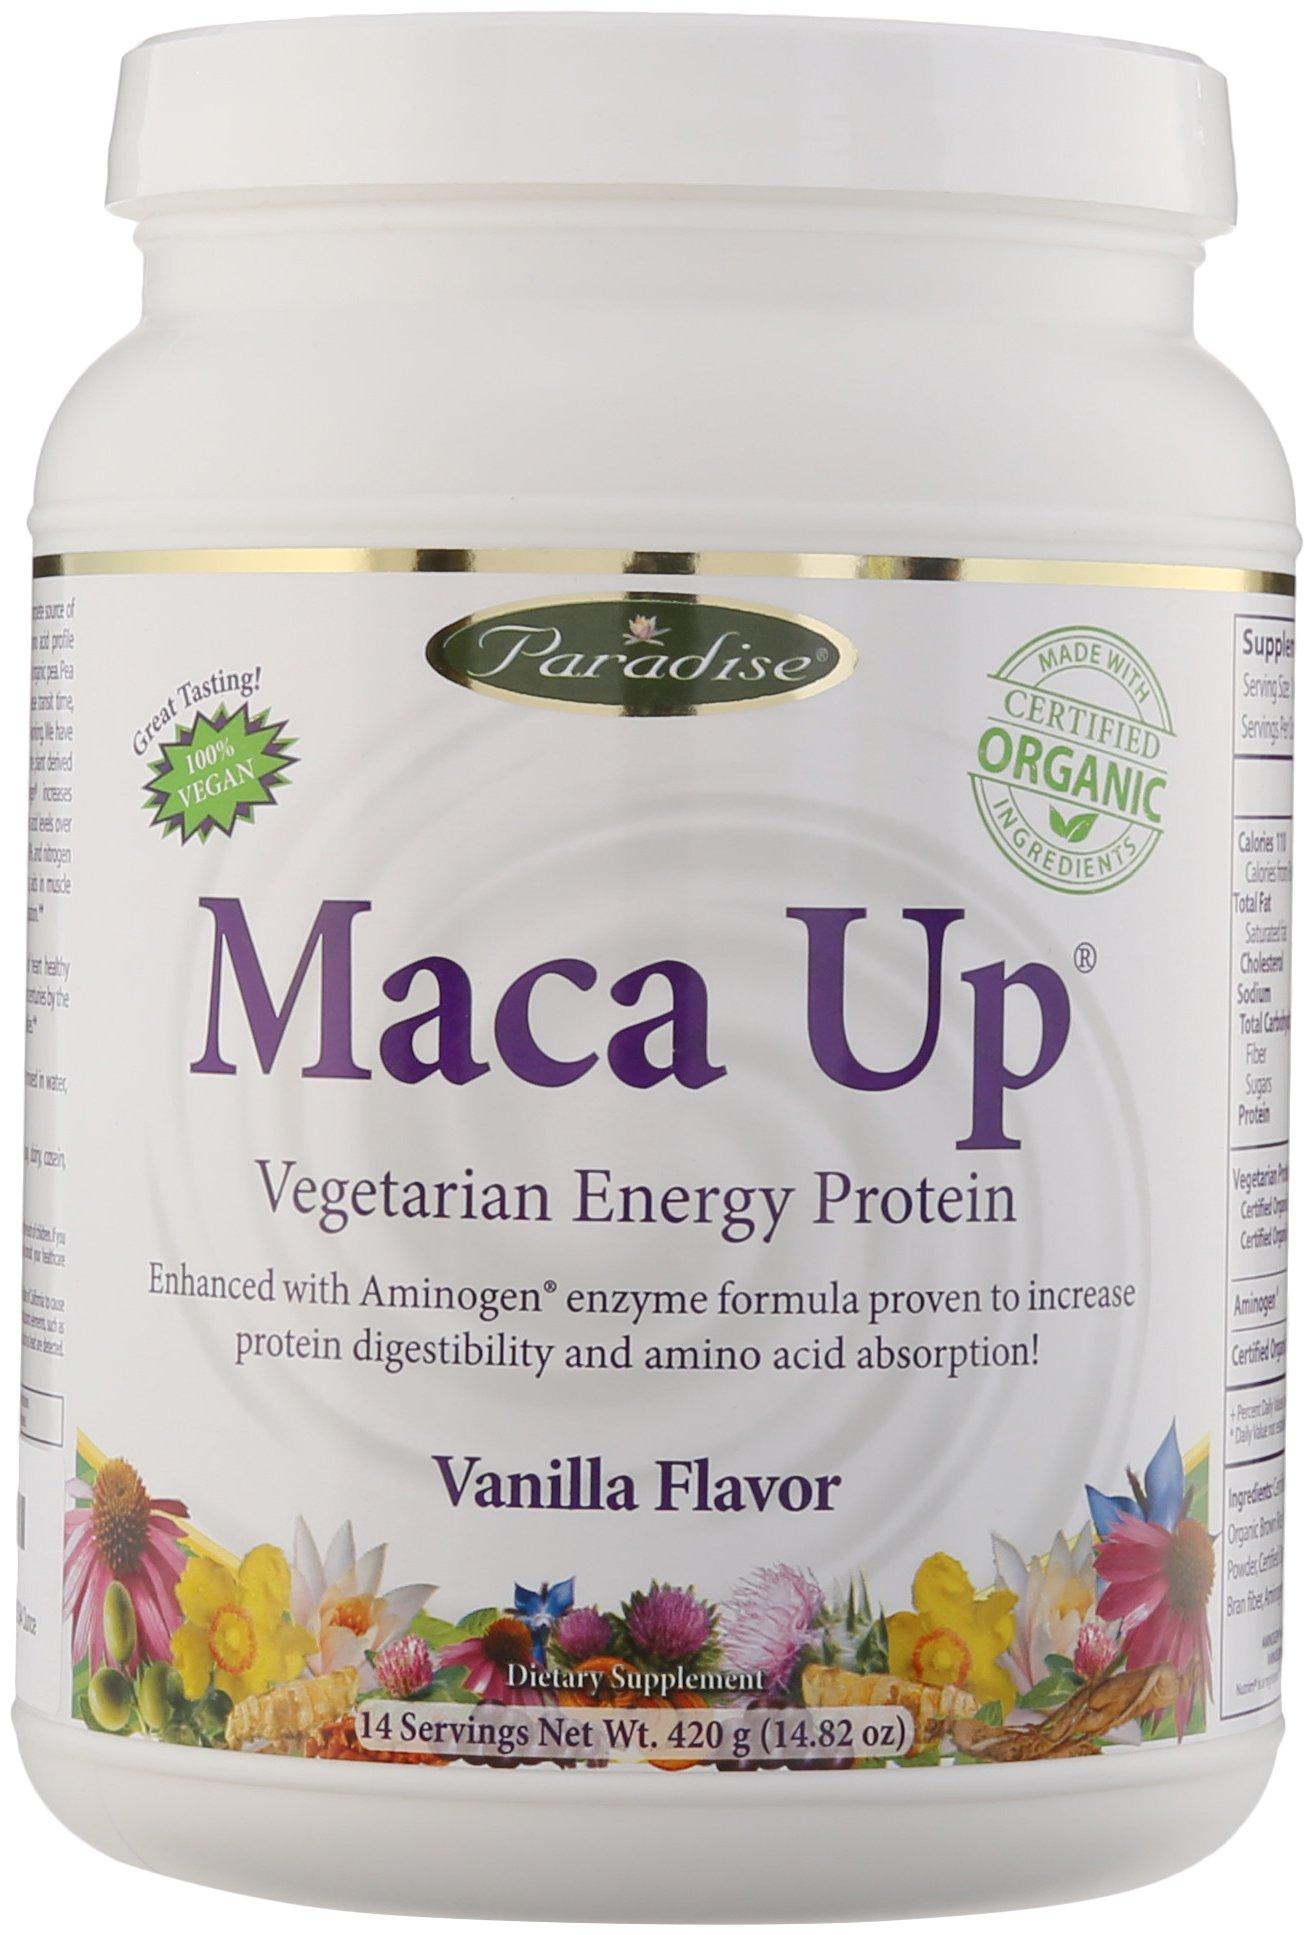 Paradise Herbs Maca Up Protein Powder, Vanilla, 14.82 Ounce